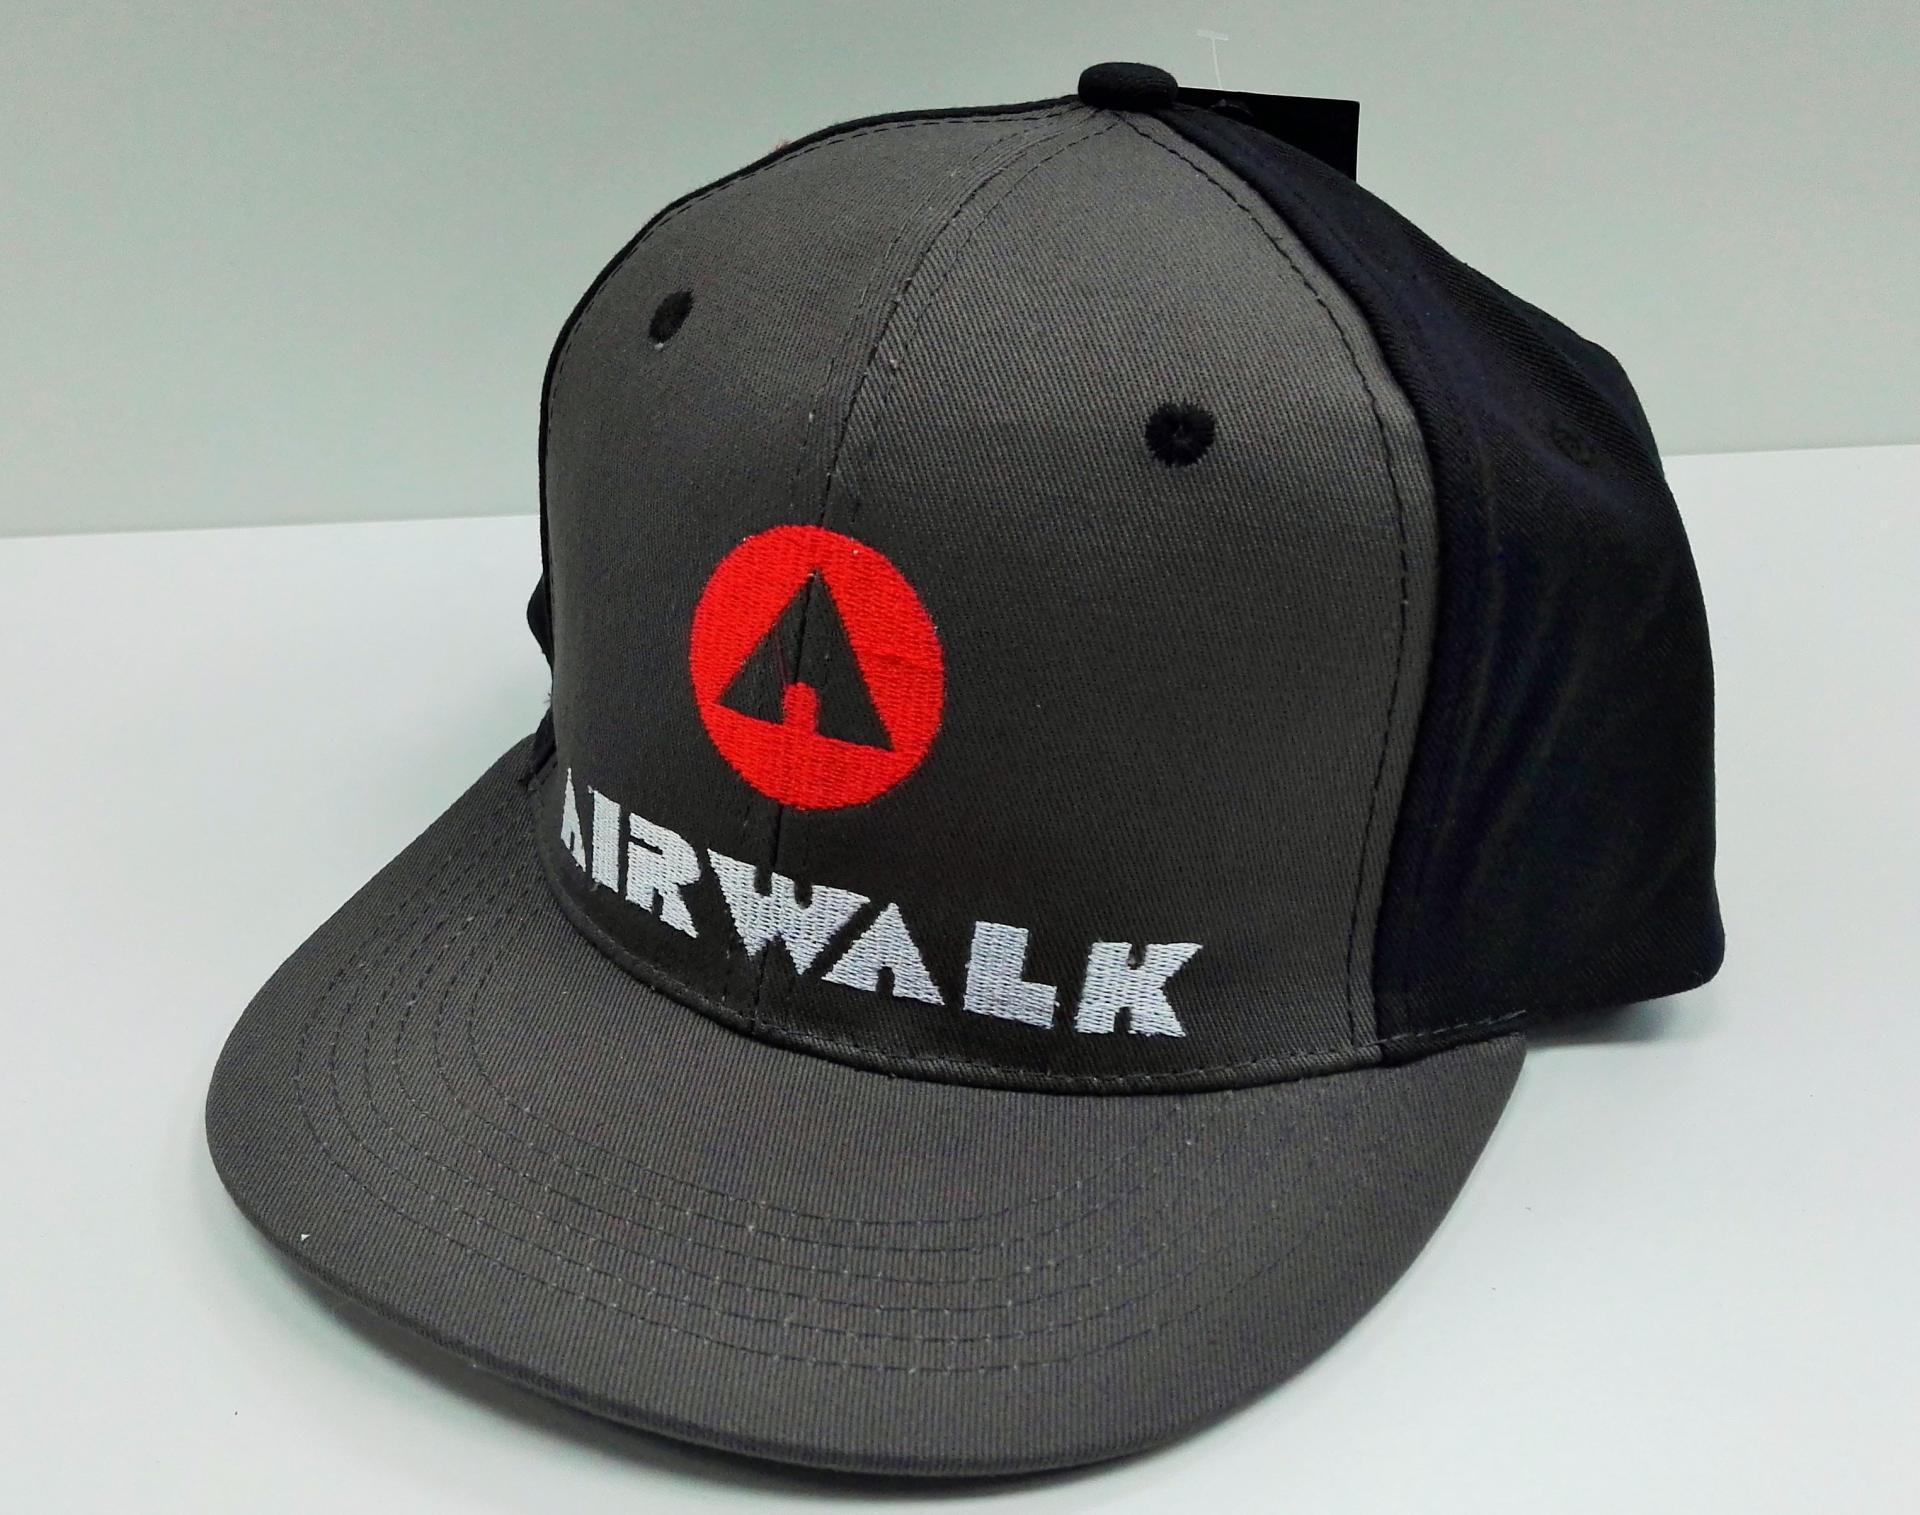 Airwalk logo gris